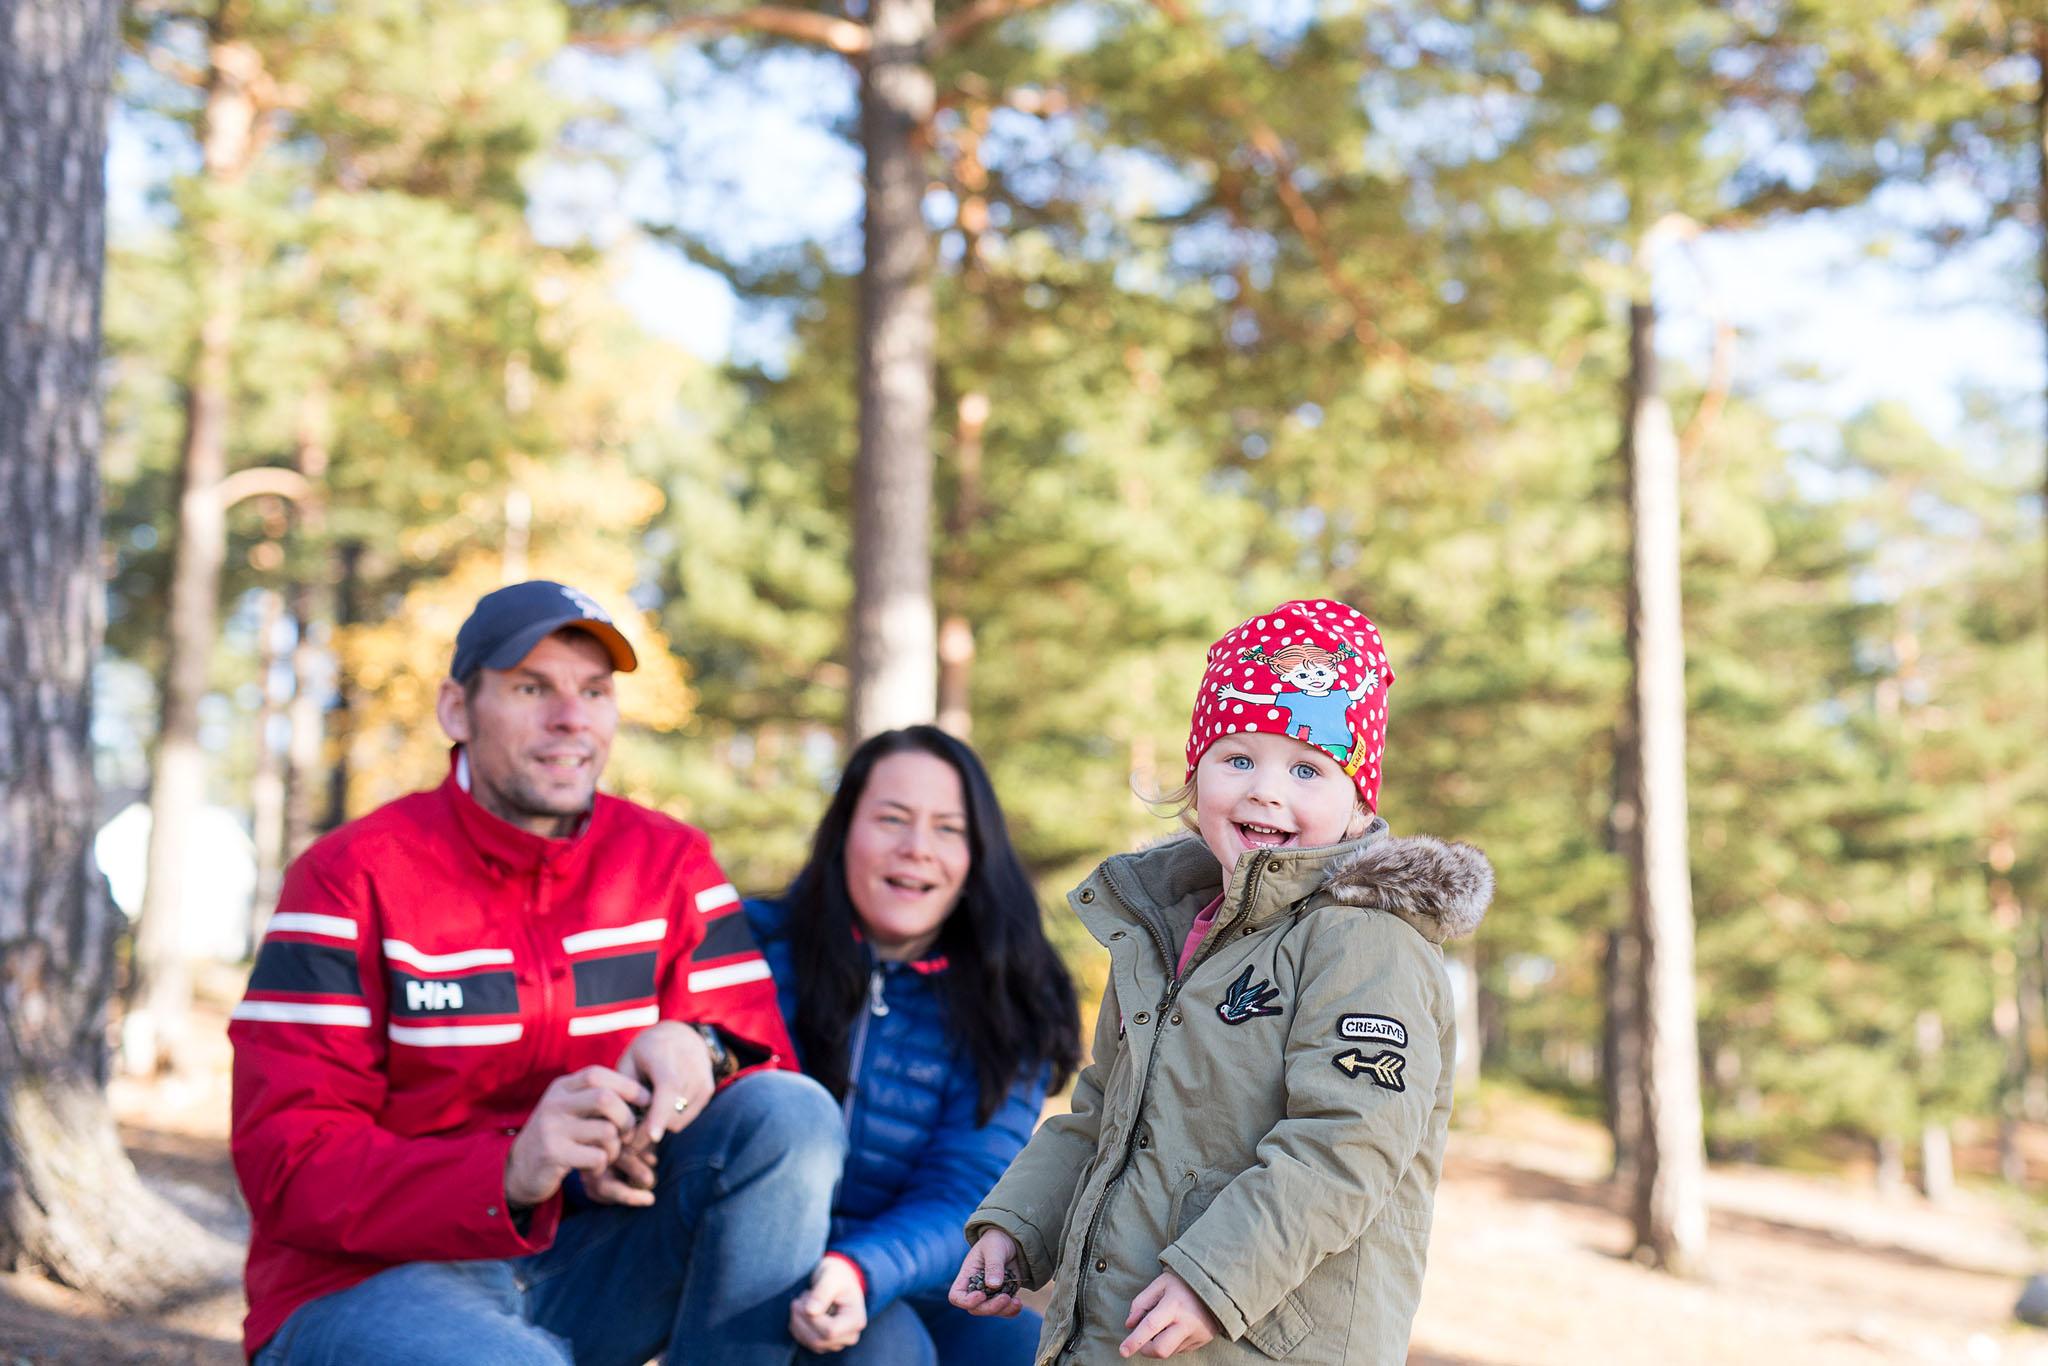 fotograf sabina wixner hudiksvall barn familj 6.jpg